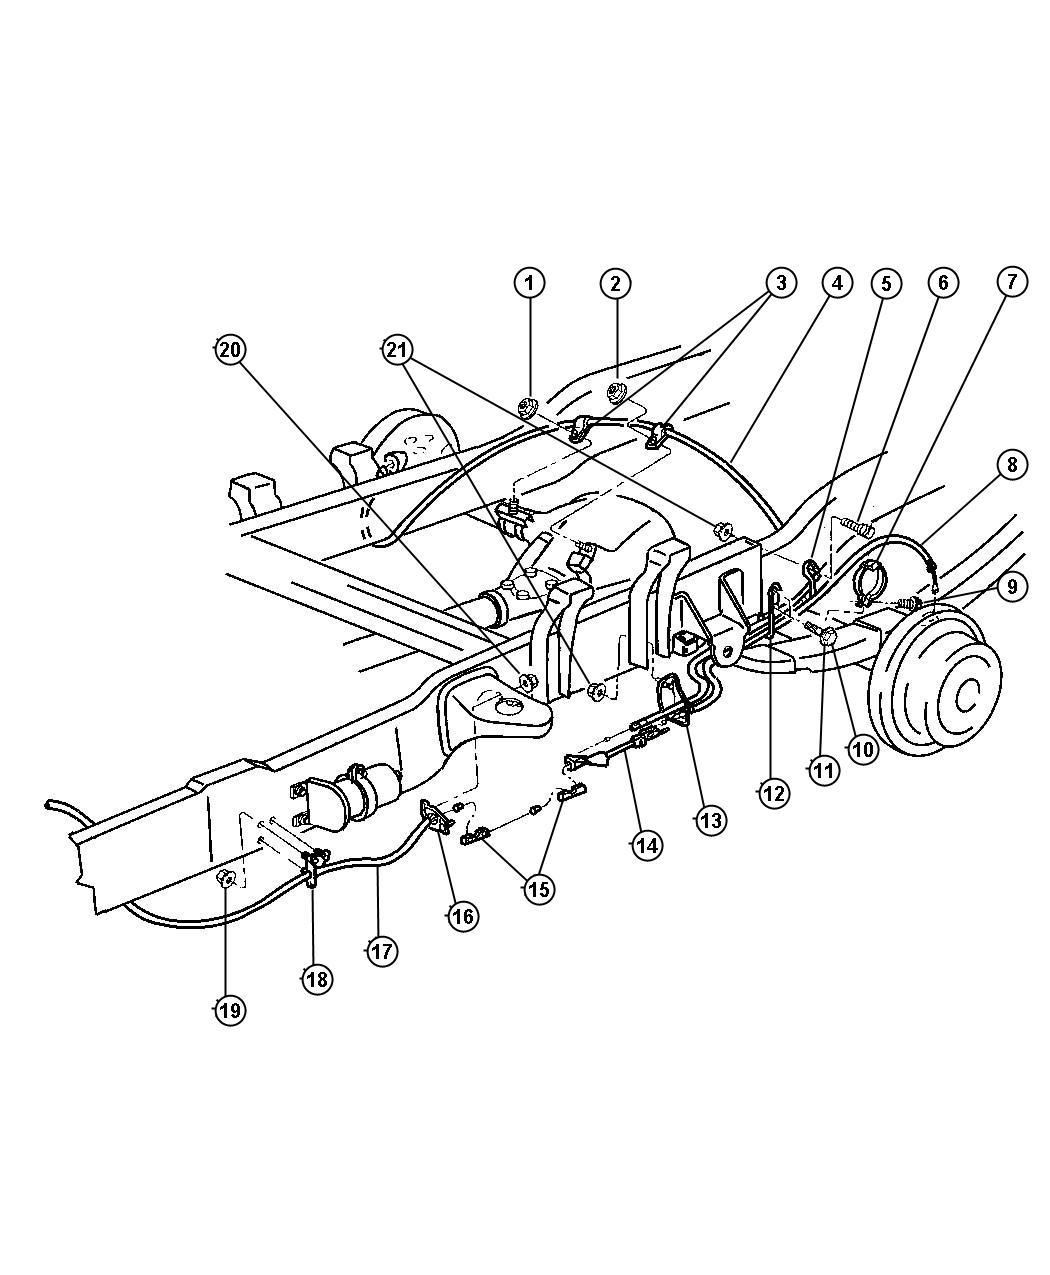 96 dodge ram 2500 v1 0 ac wiring diagram furthermore 7 3 powerstroke sel engine diagram